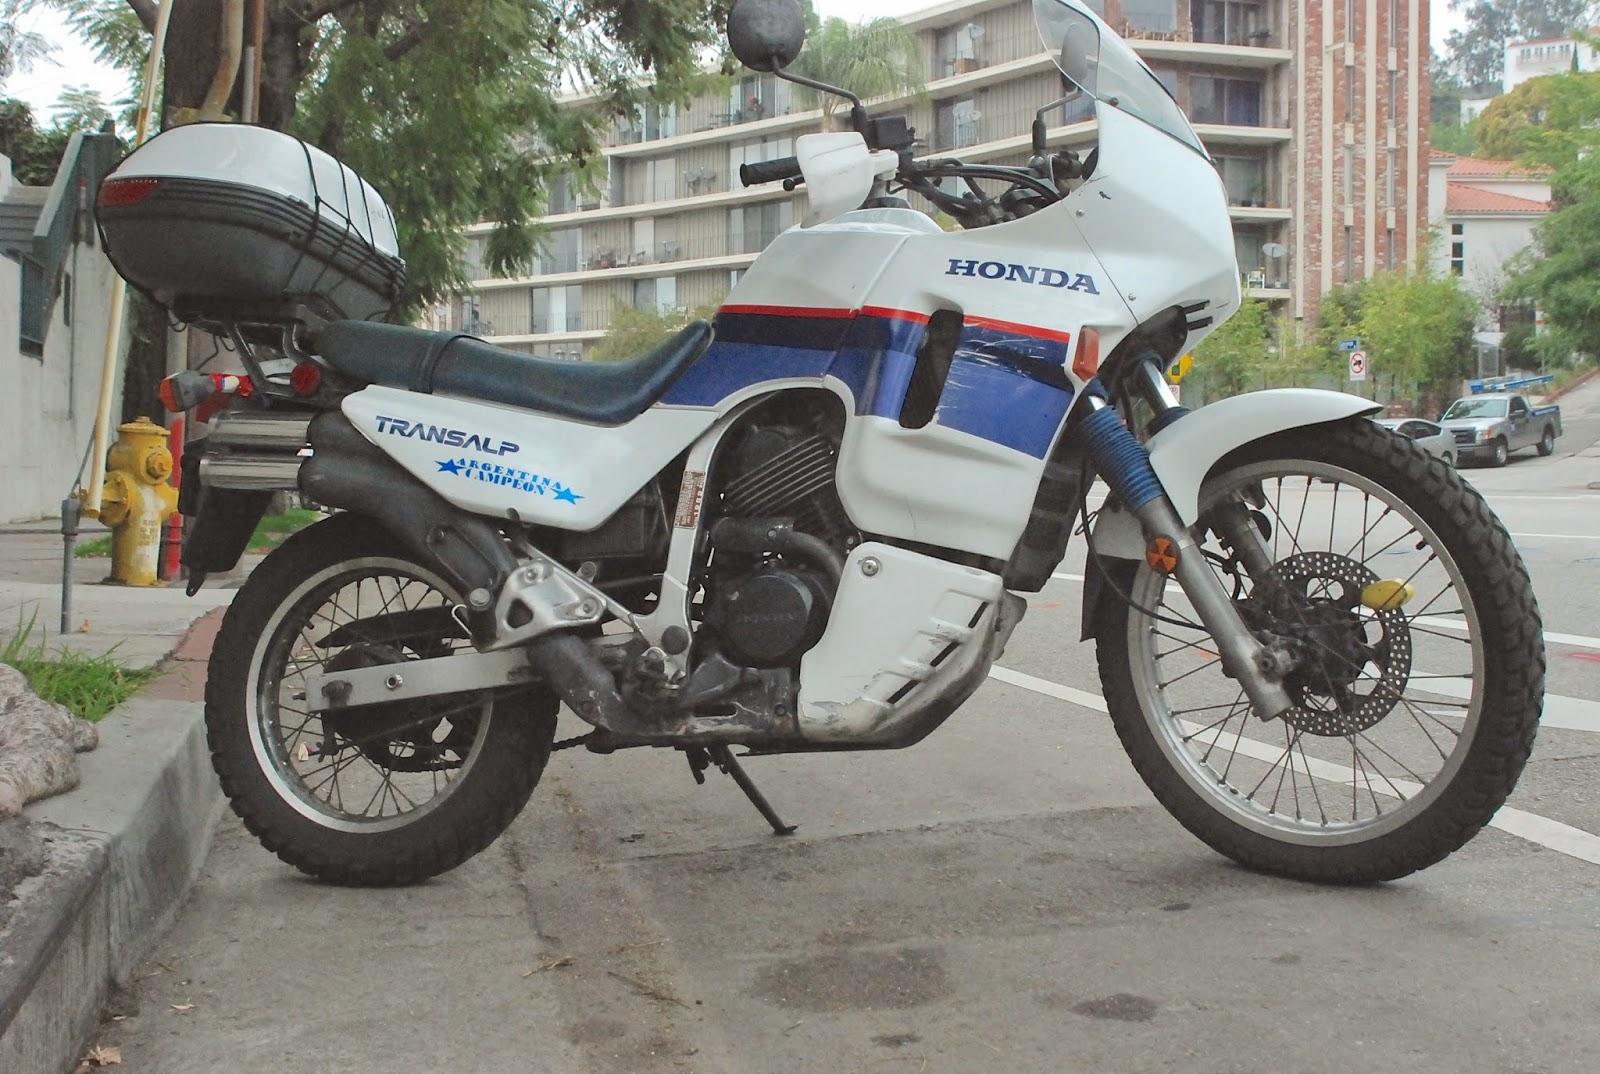 http://freelancethink.blogspot.com/2014/12/best-budget-touring-motorcycles-bmw.html